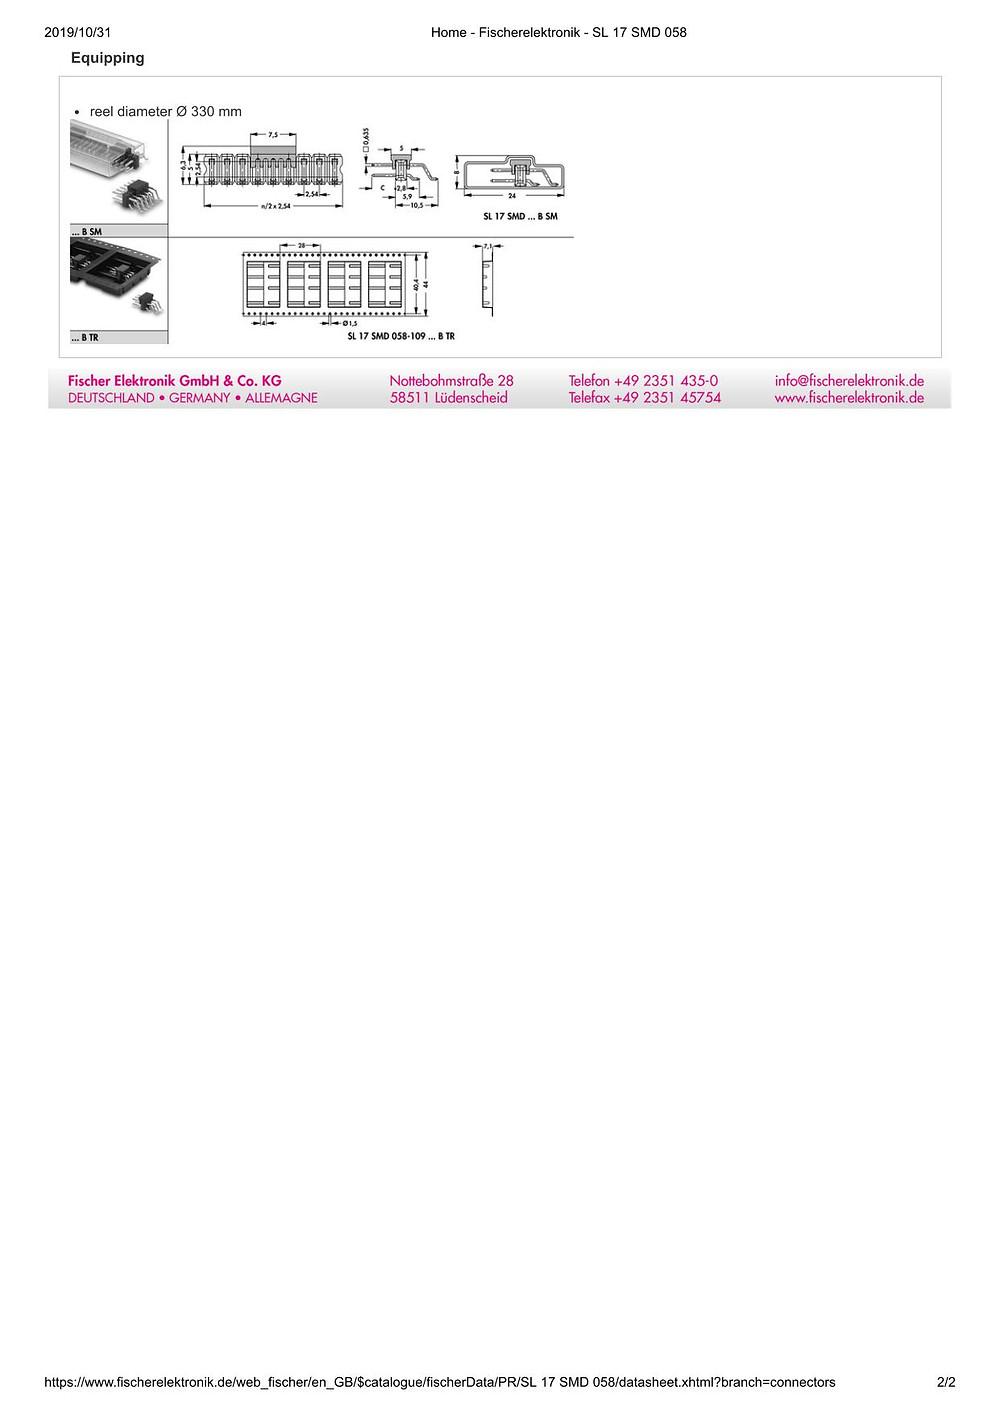 SL 17 SMD 058 フィッシャー テープ&リール対応 表面実装用ピンヘッダ ライトアングル2列 2.54㎜ピッチ □0.635mm 6-26ピン